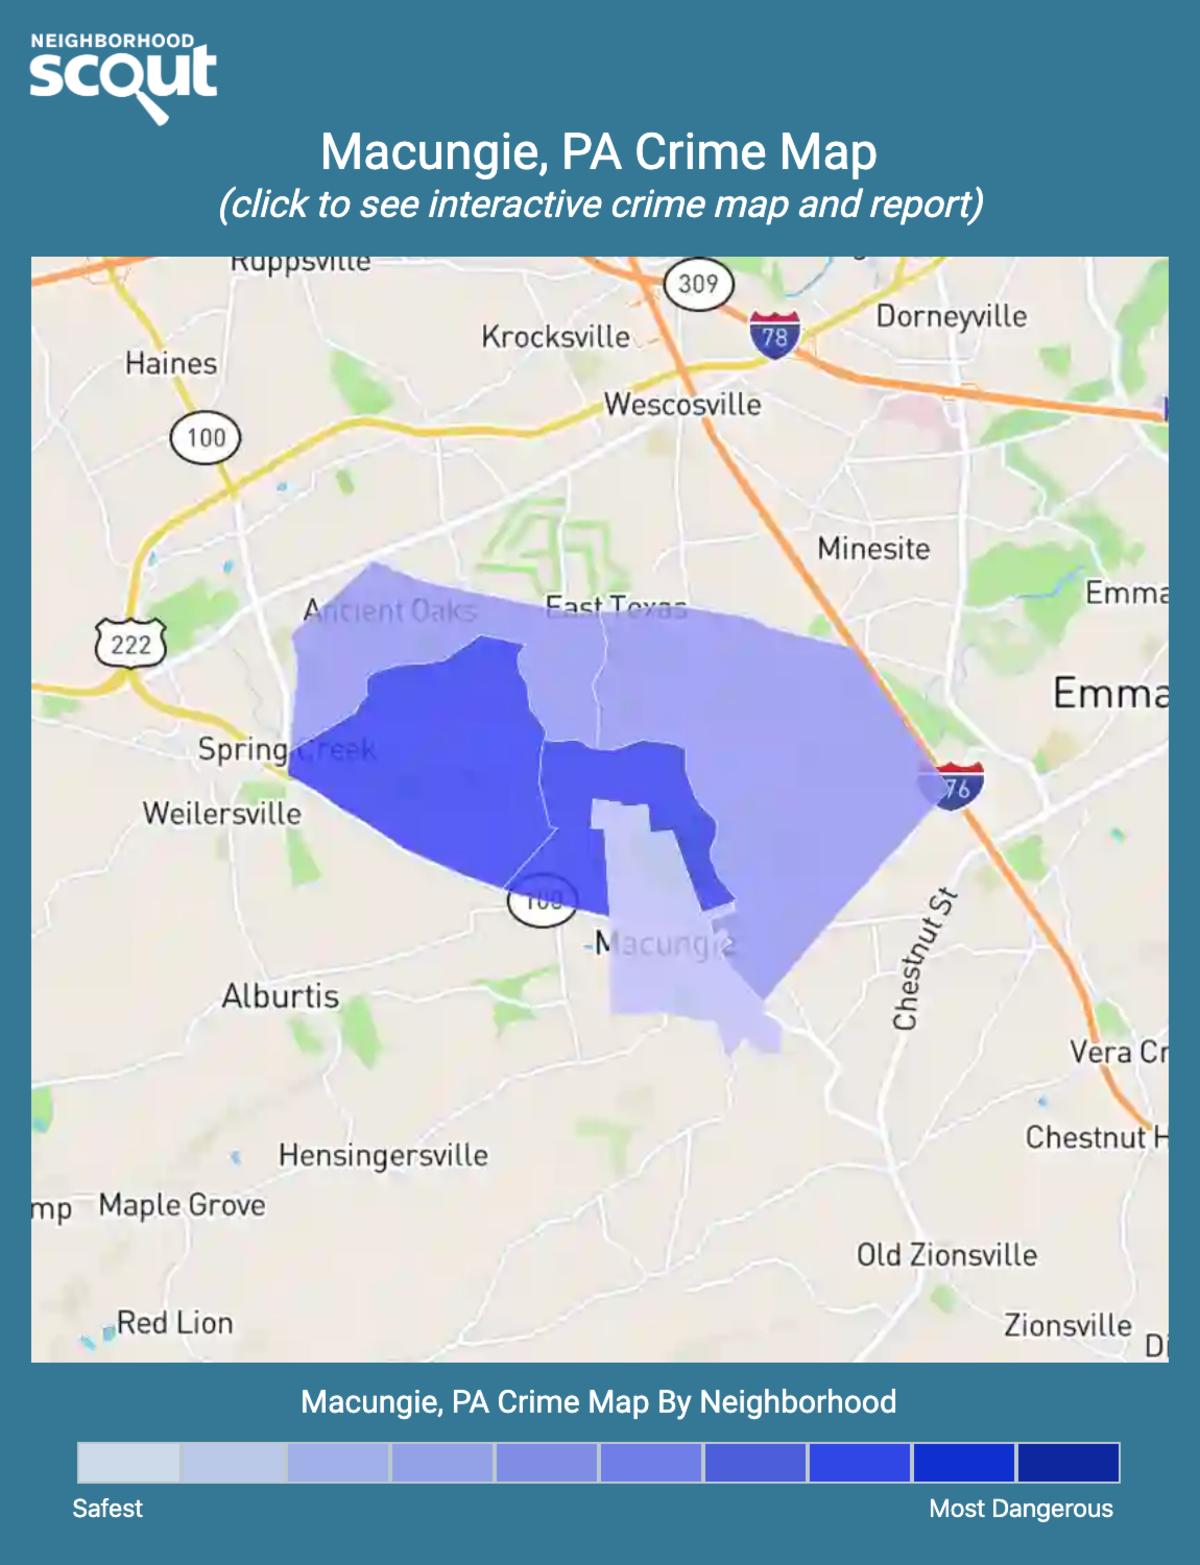 Macungie, Pennsylvania crime map